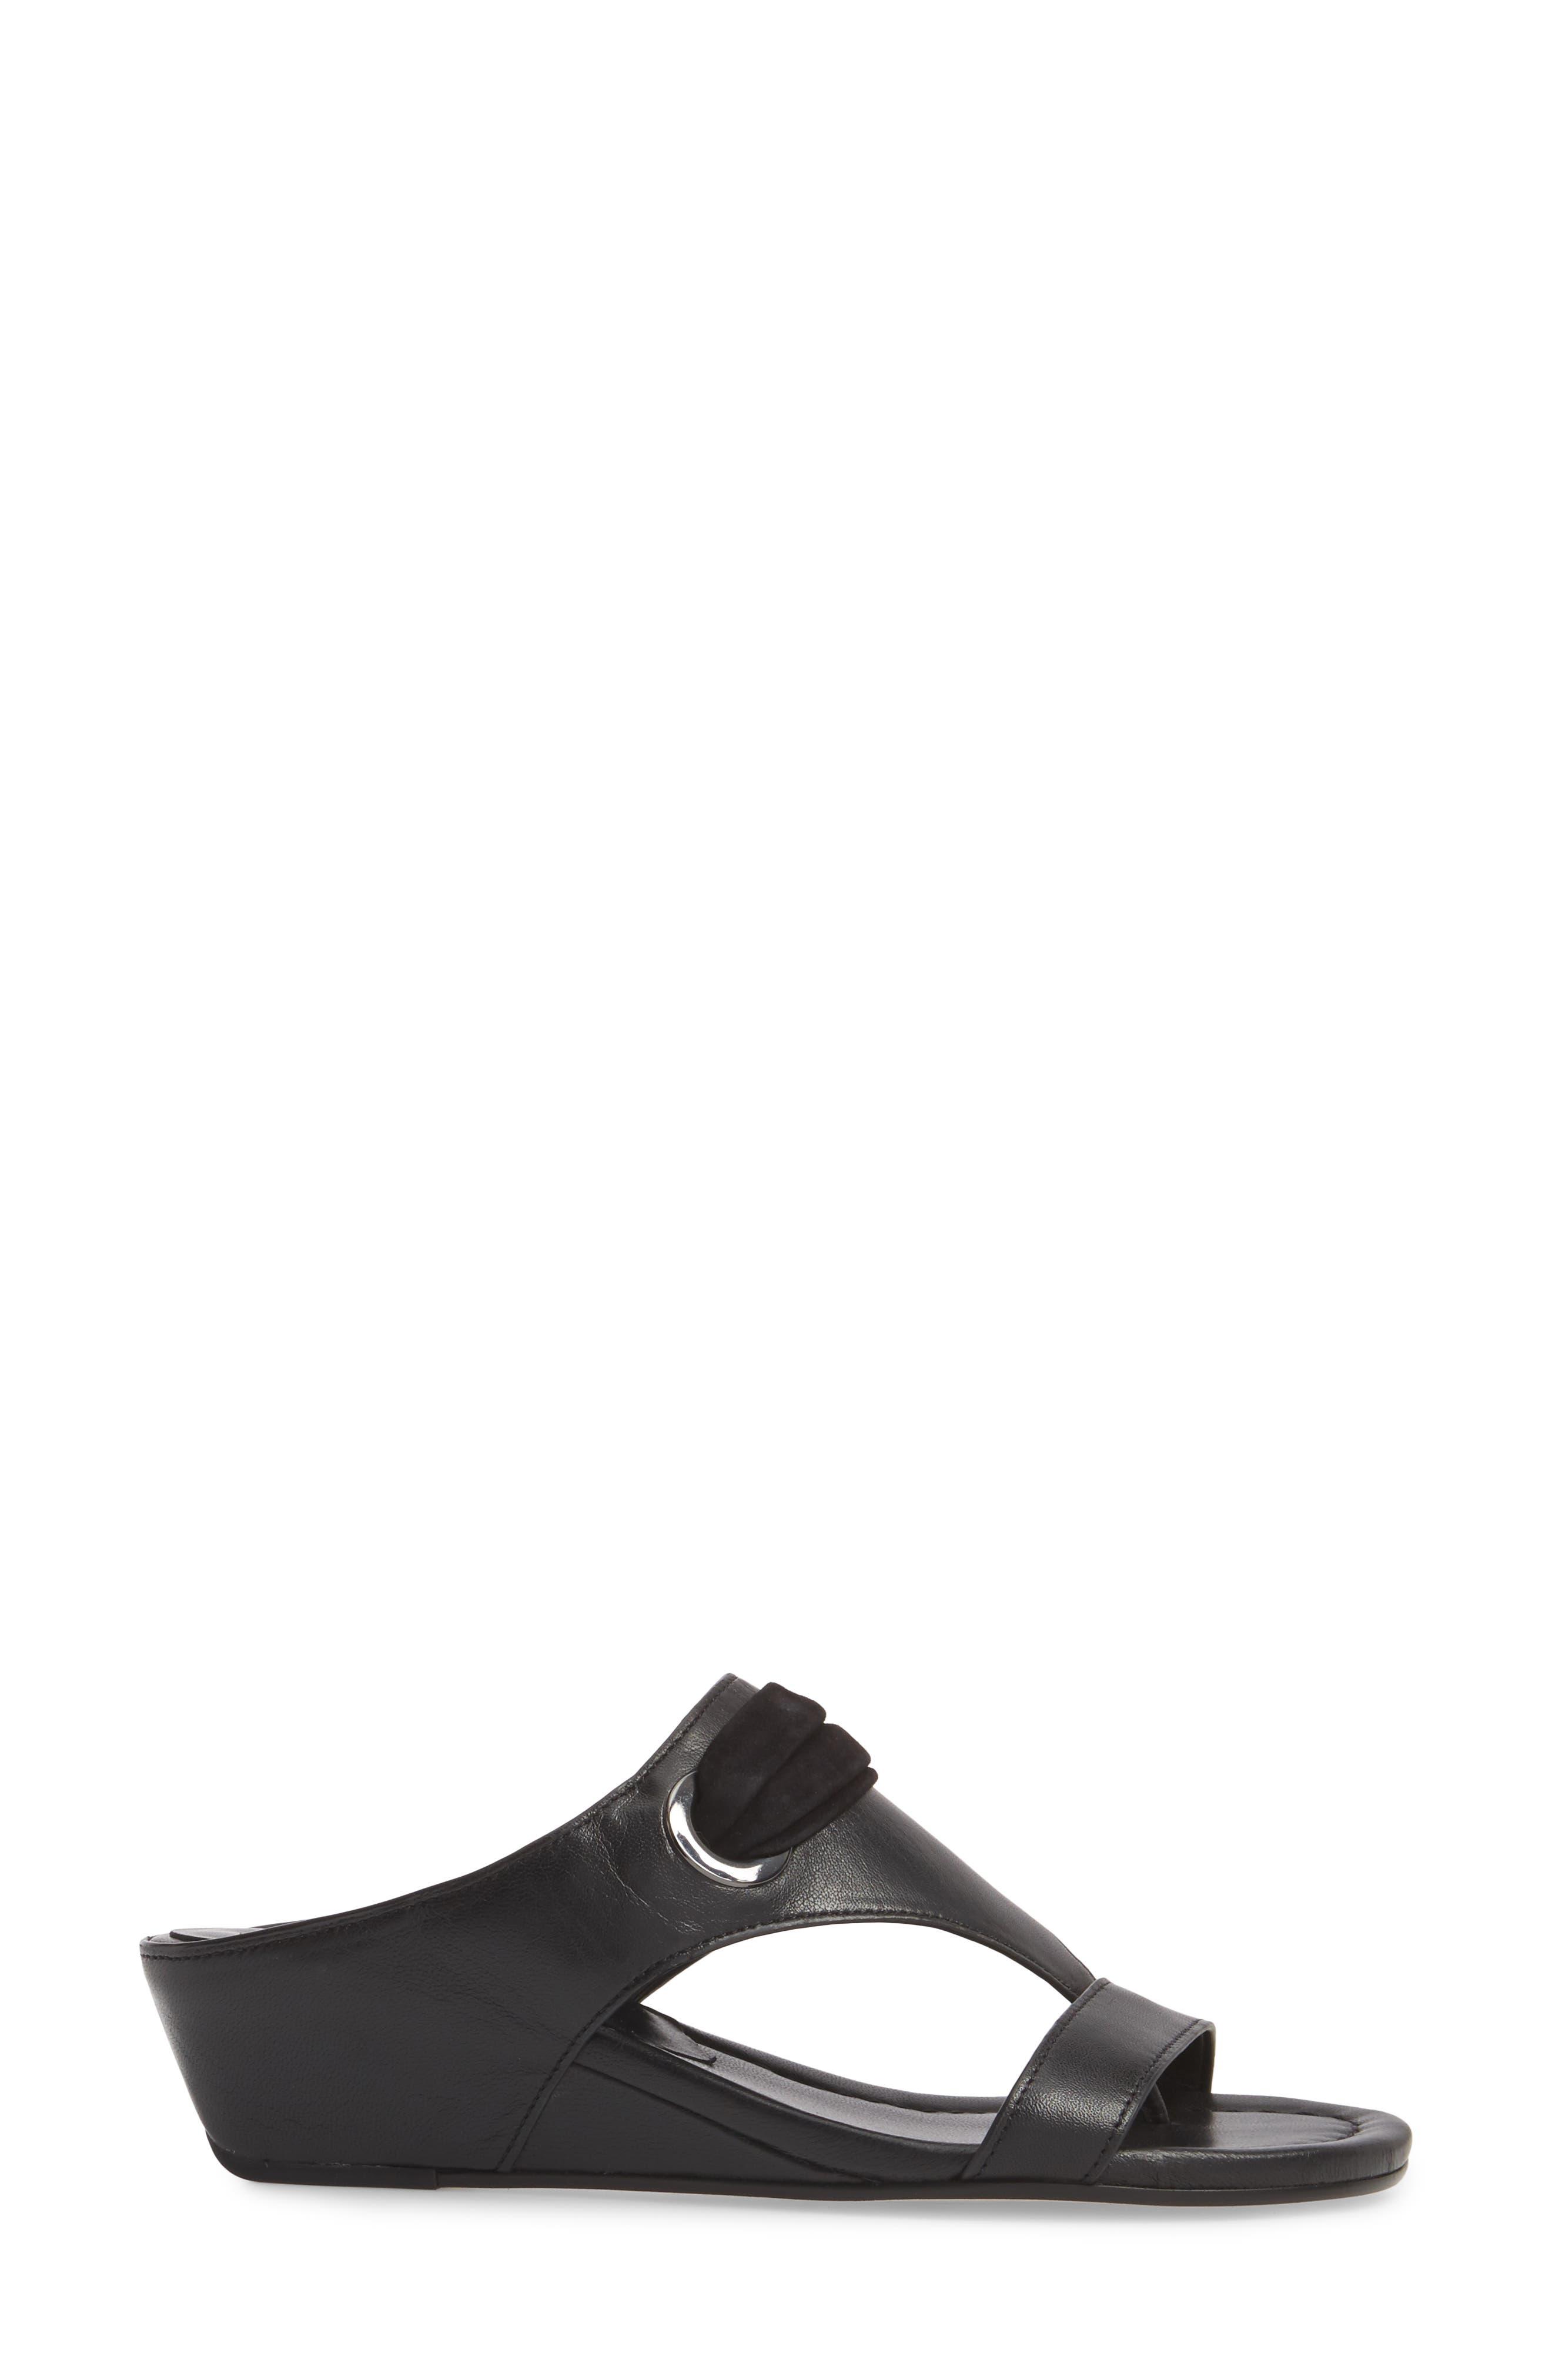 Dionne Wedge Sandal,                             Alternate thumbnail 5, color,